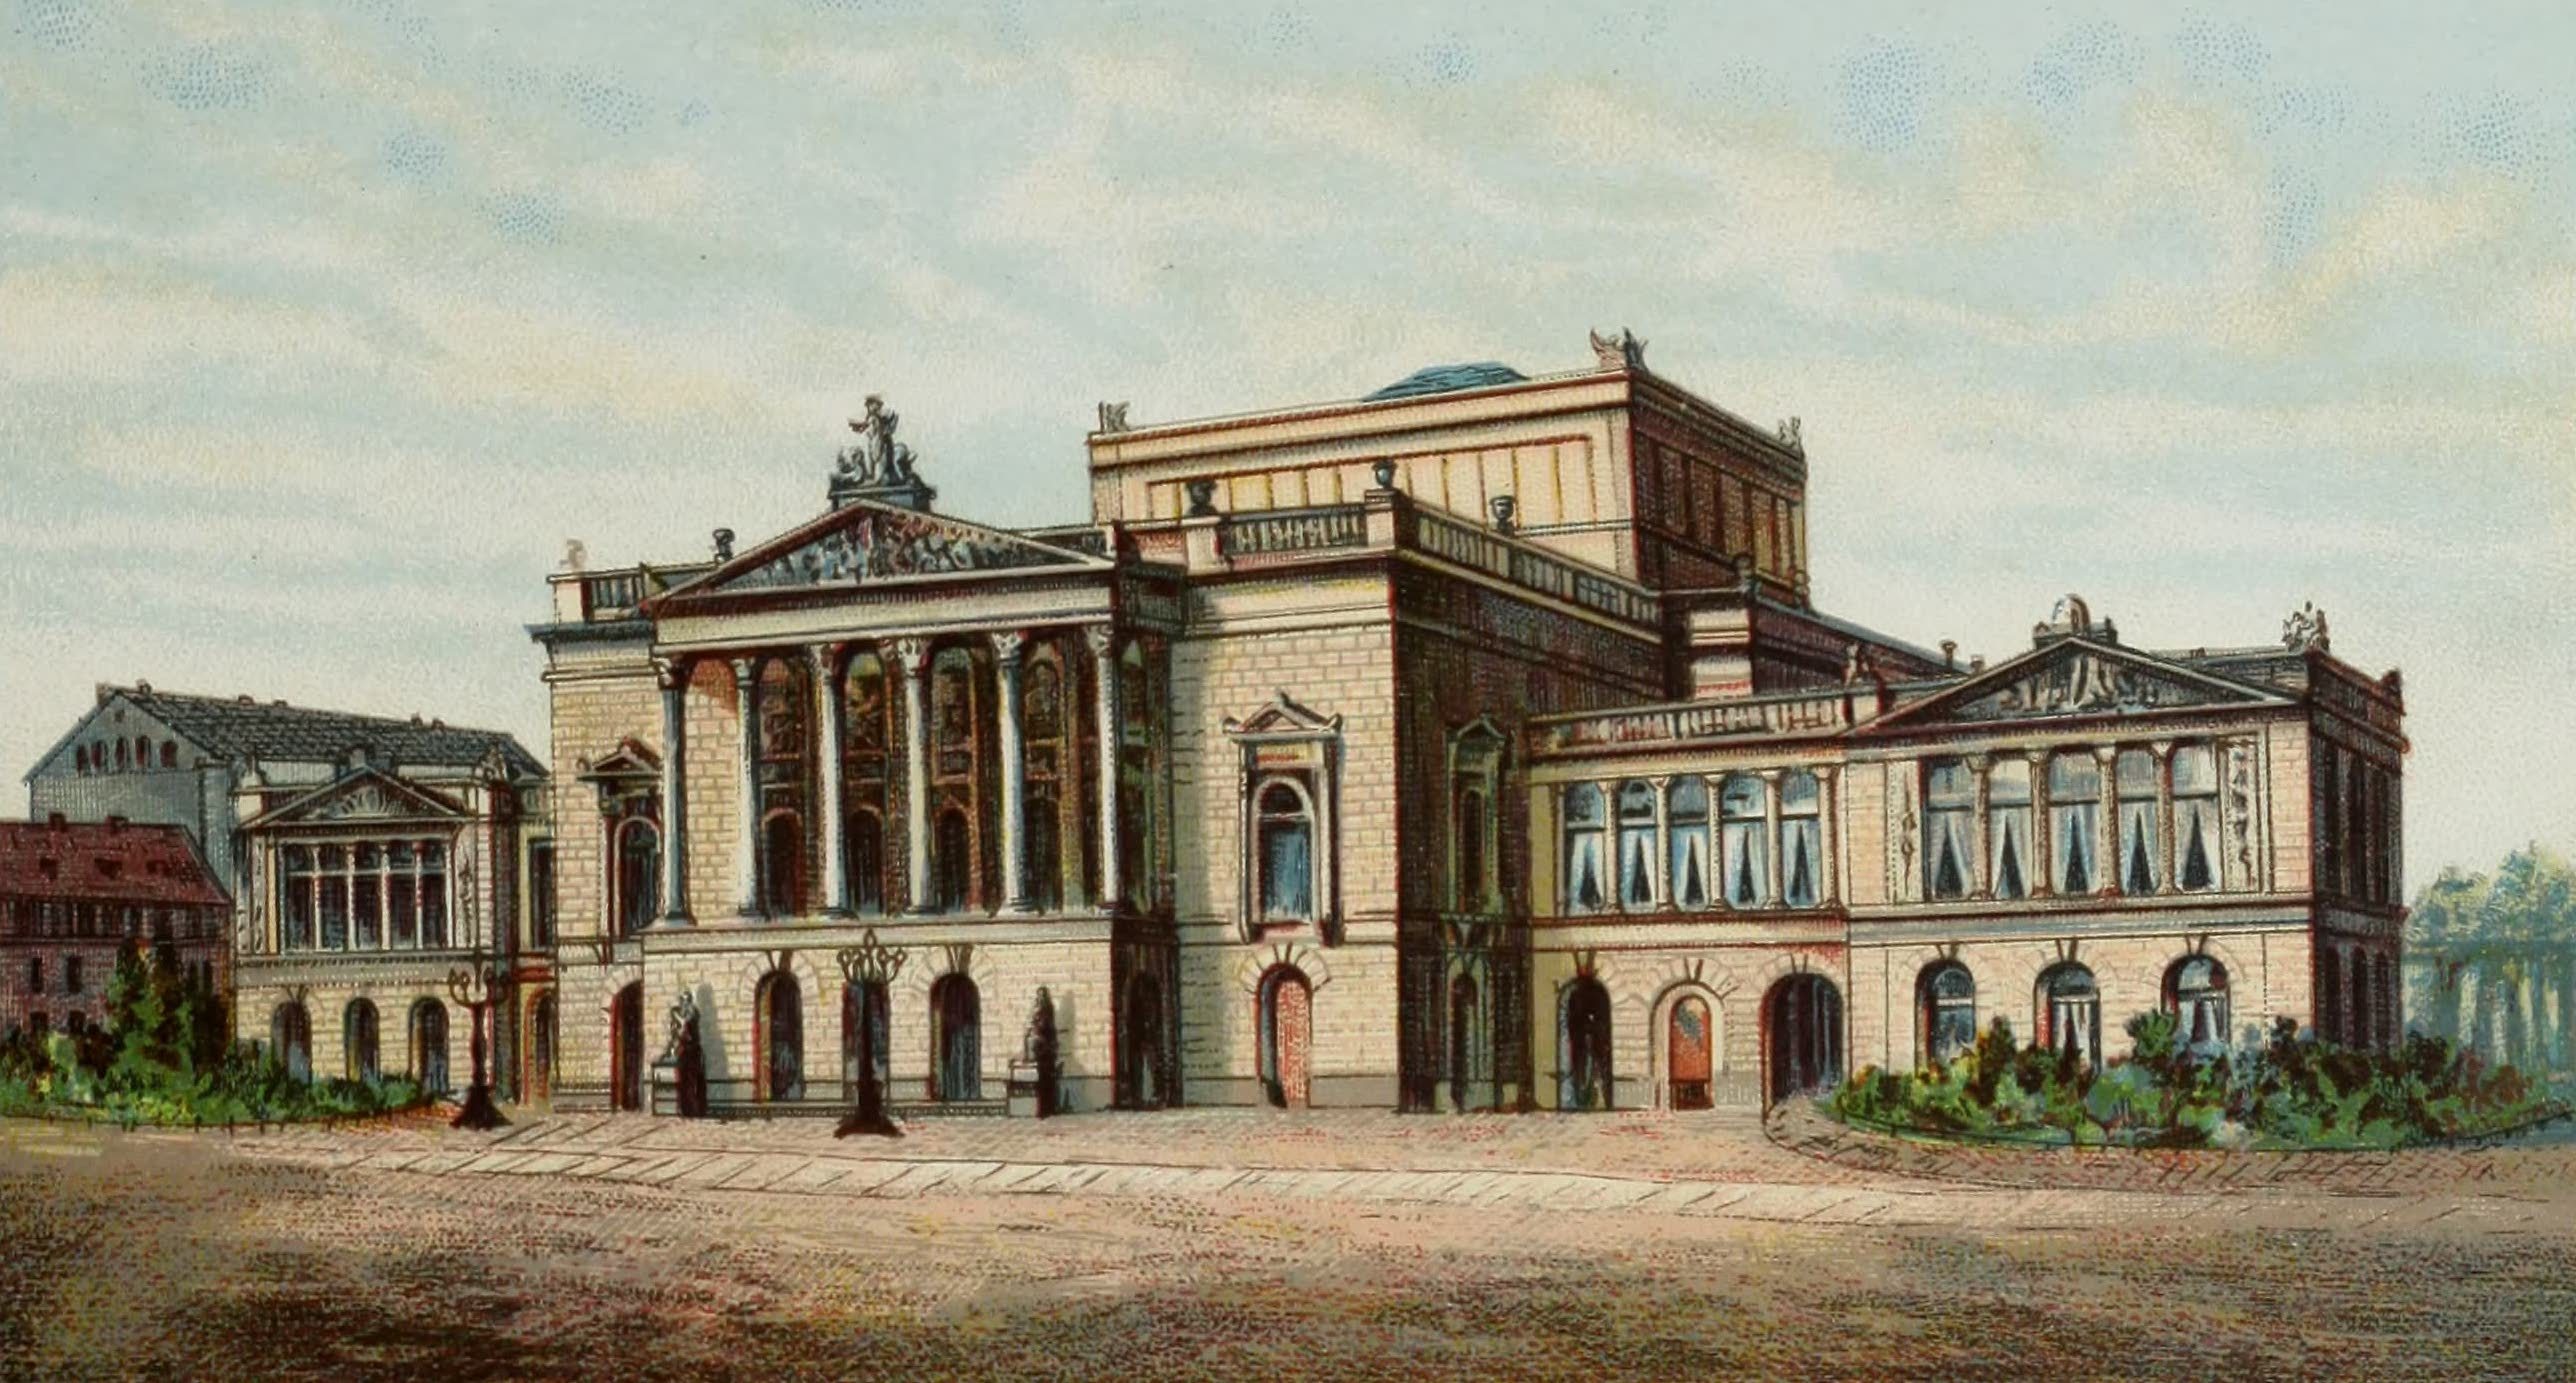 Album von Leipzig - Neues Theater (1884)